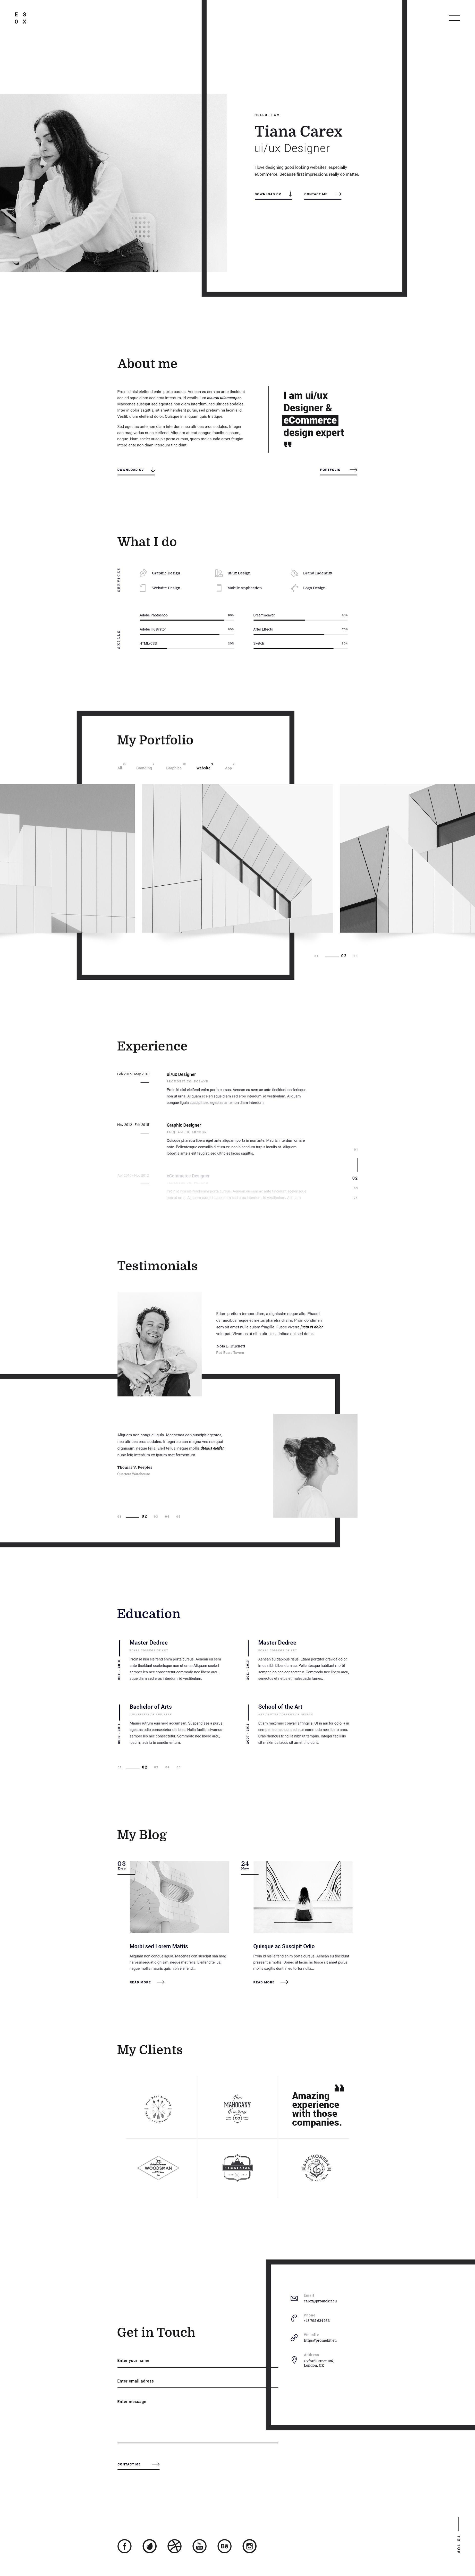 Esox Personal Resume / CV / vCard PSD Template Psd